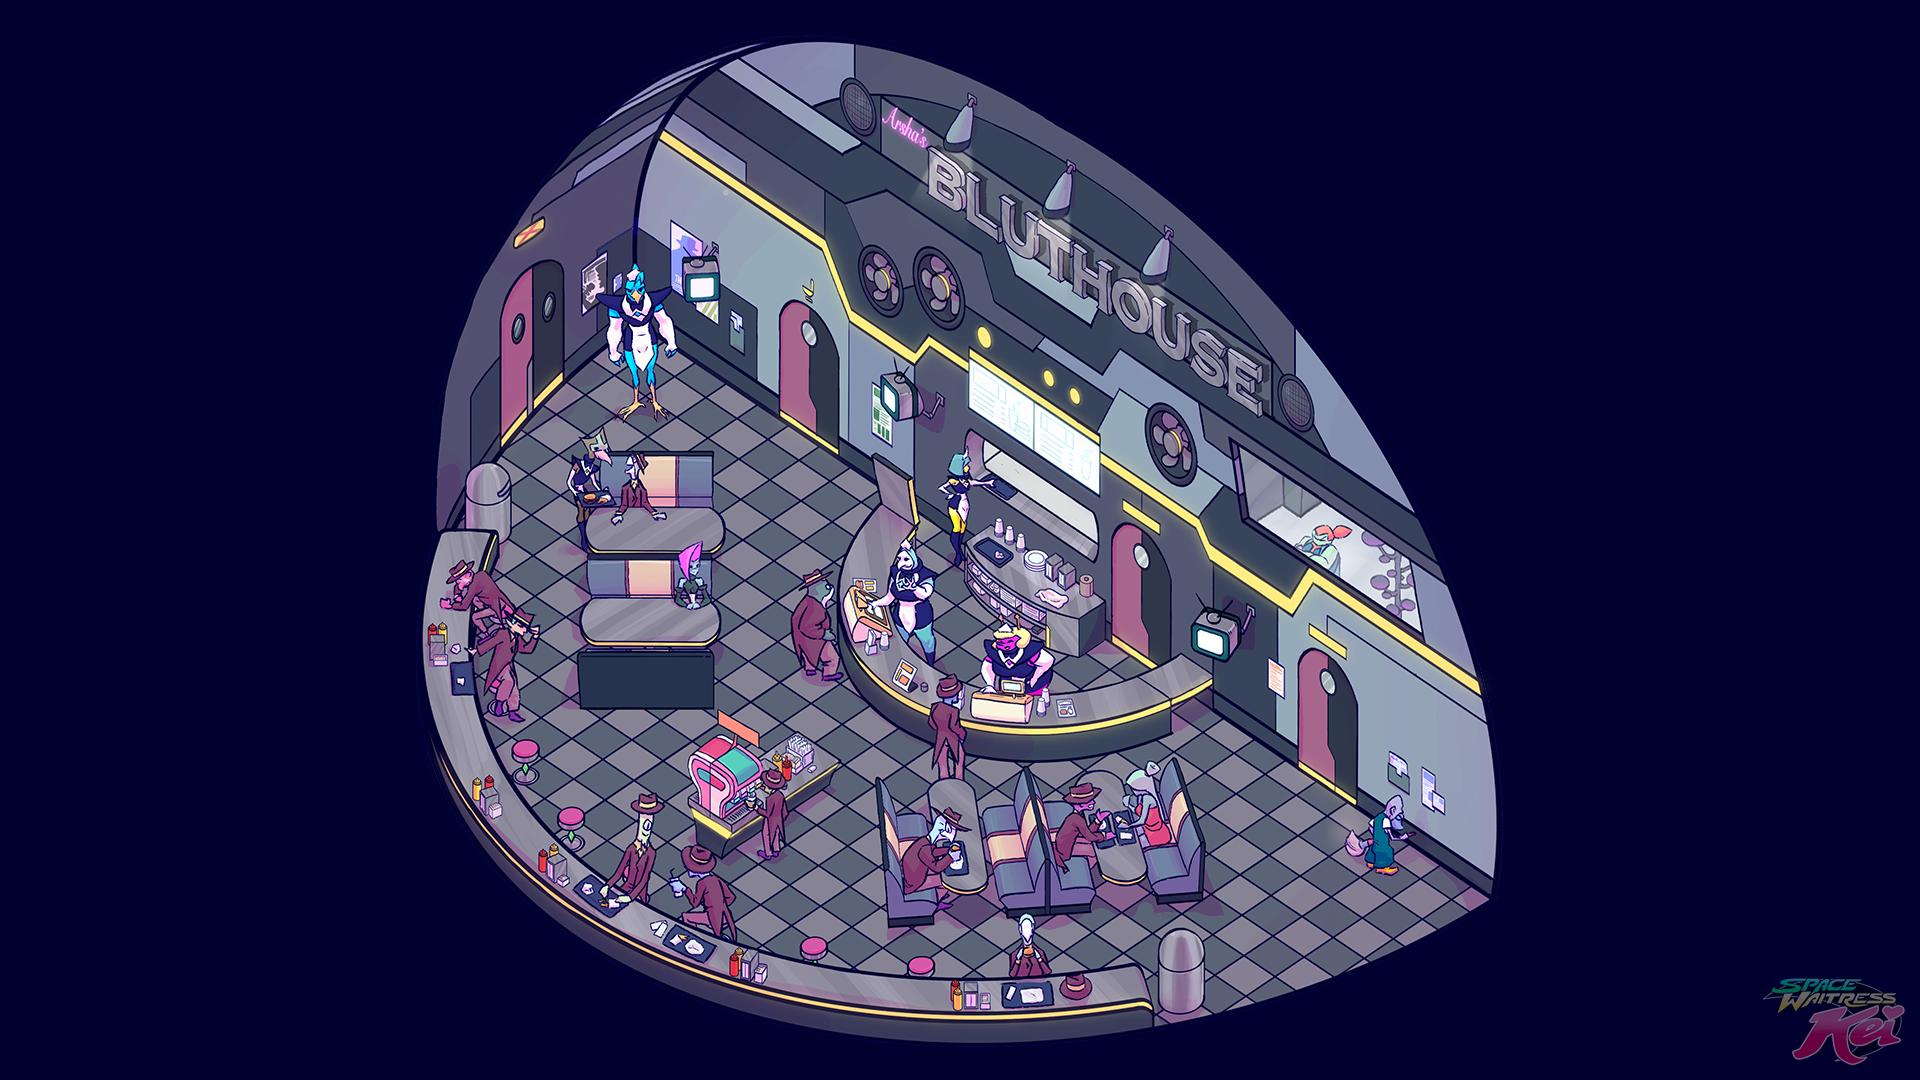 Arsha's Bluthouse